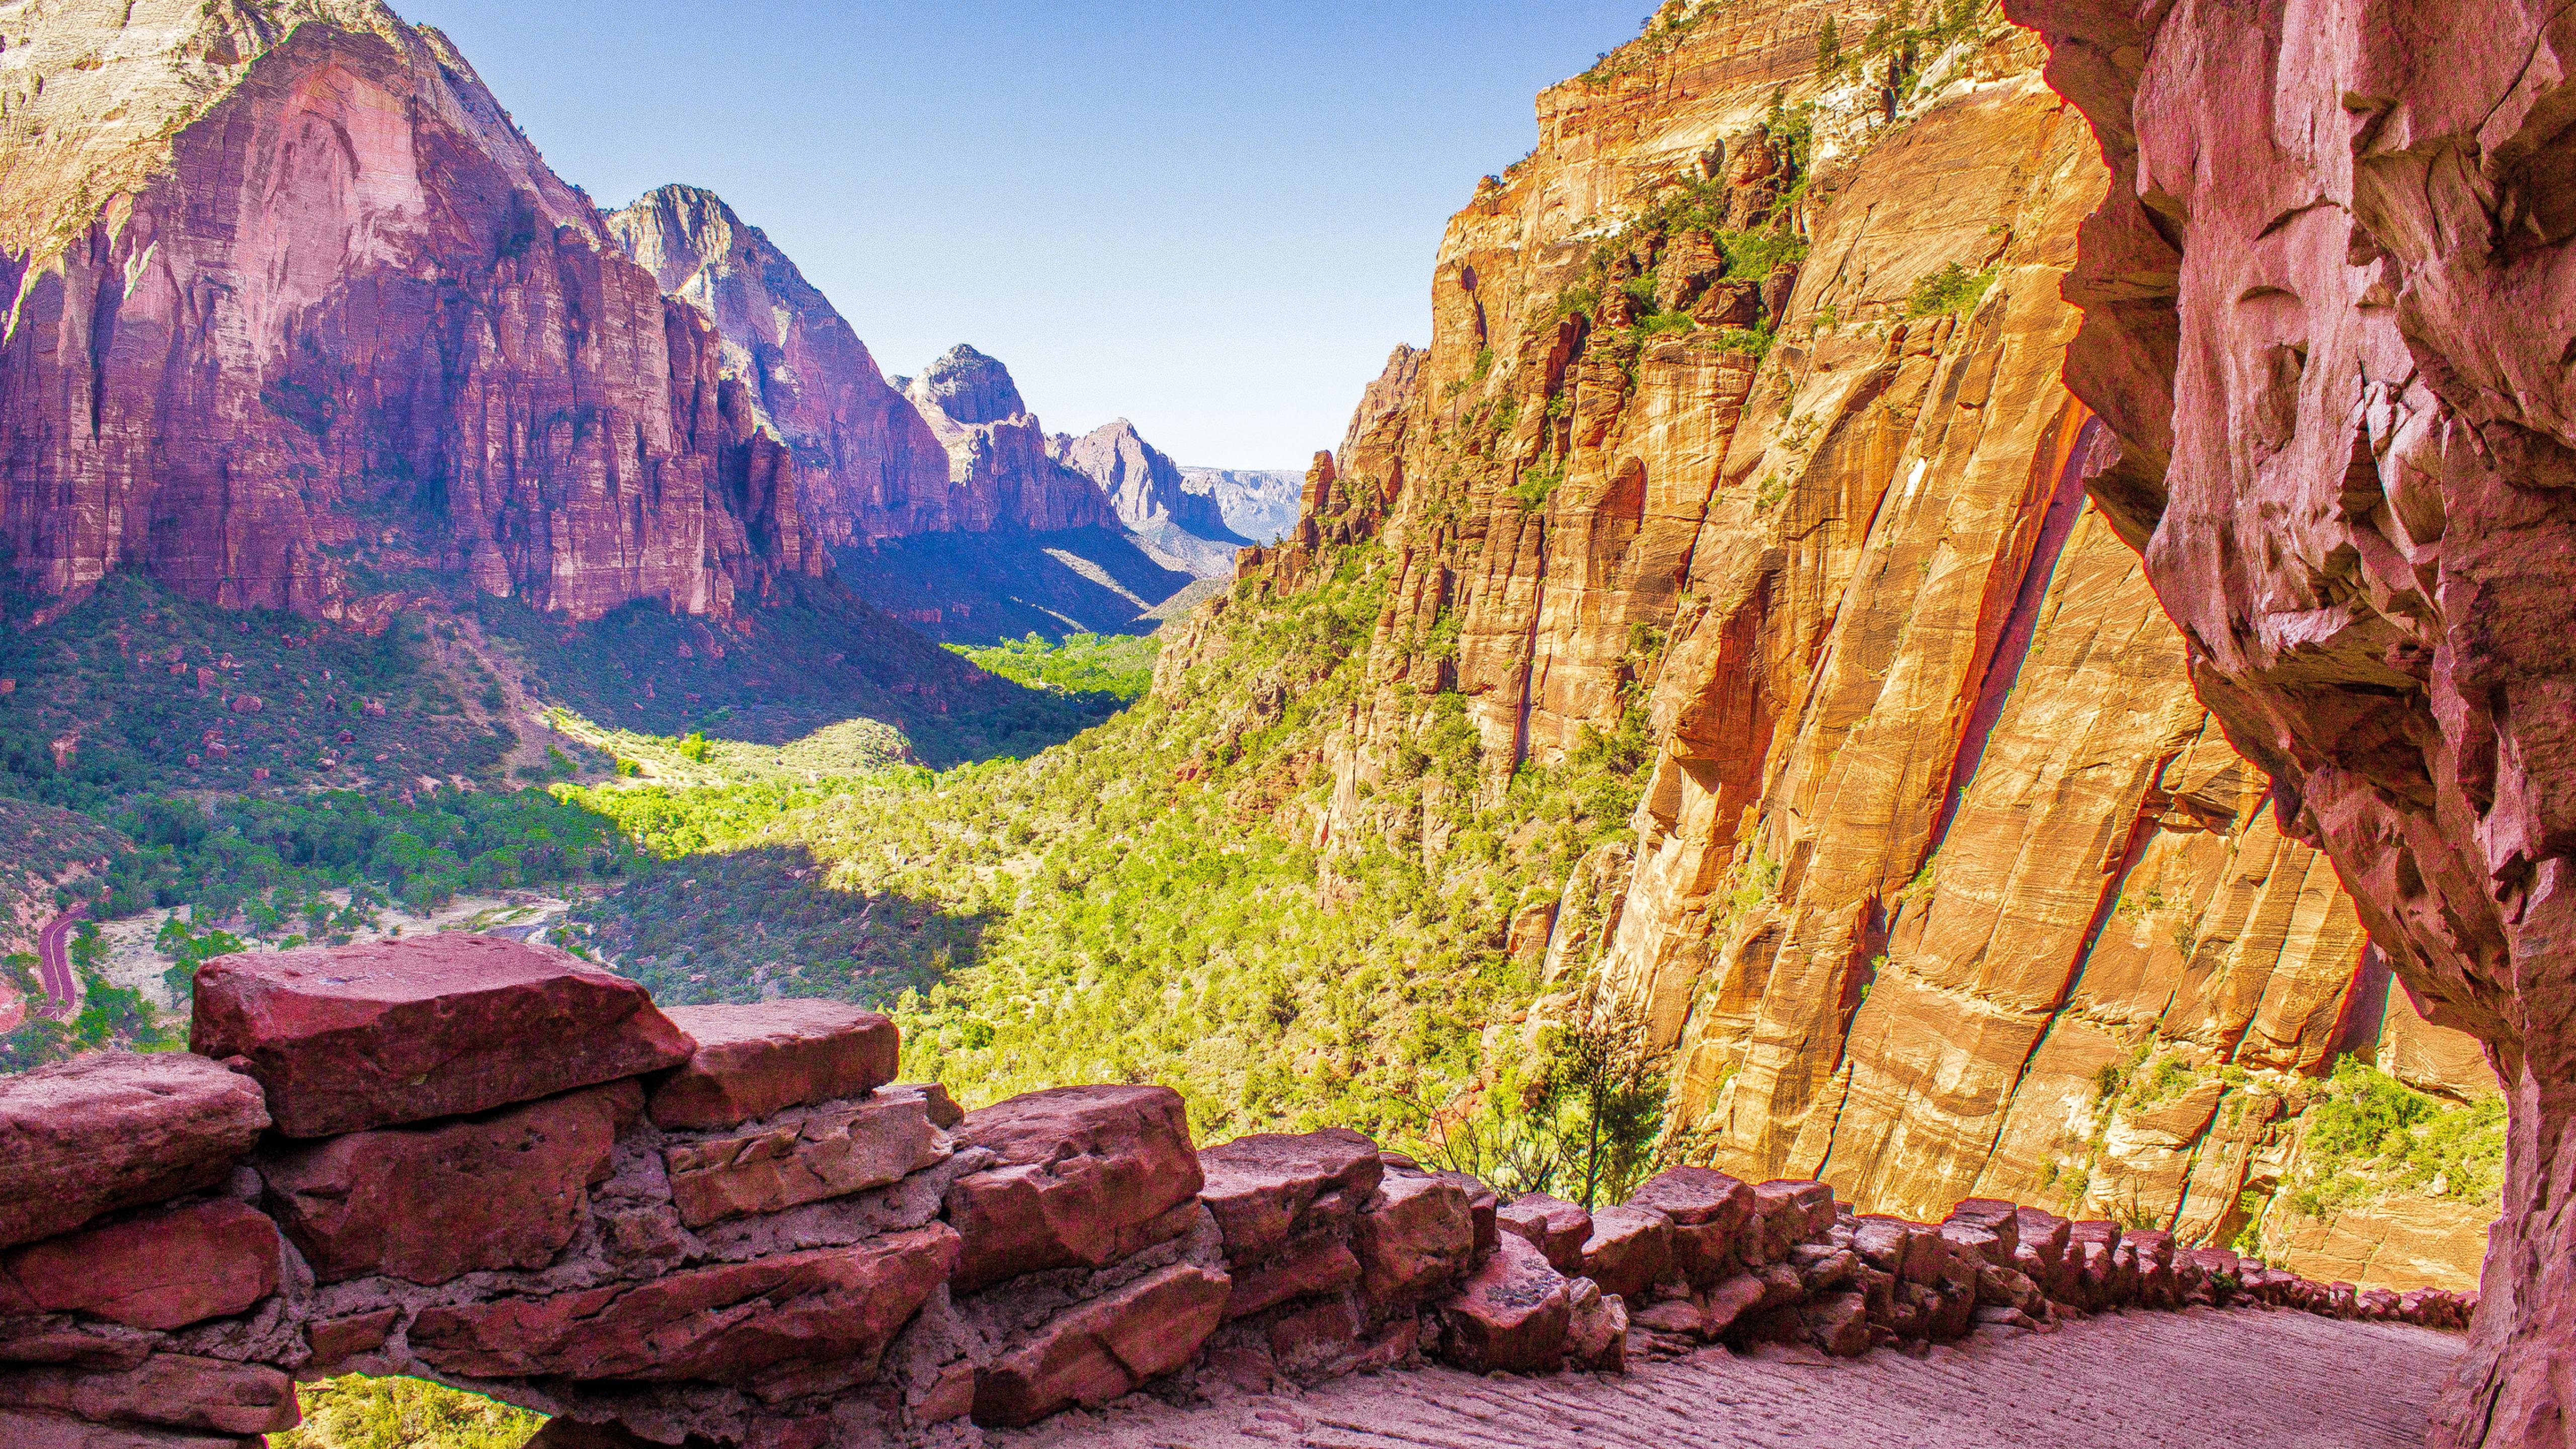 5120x2880 Zion National Park Utah Usa 5k Wallpaper Hd Nature 4k